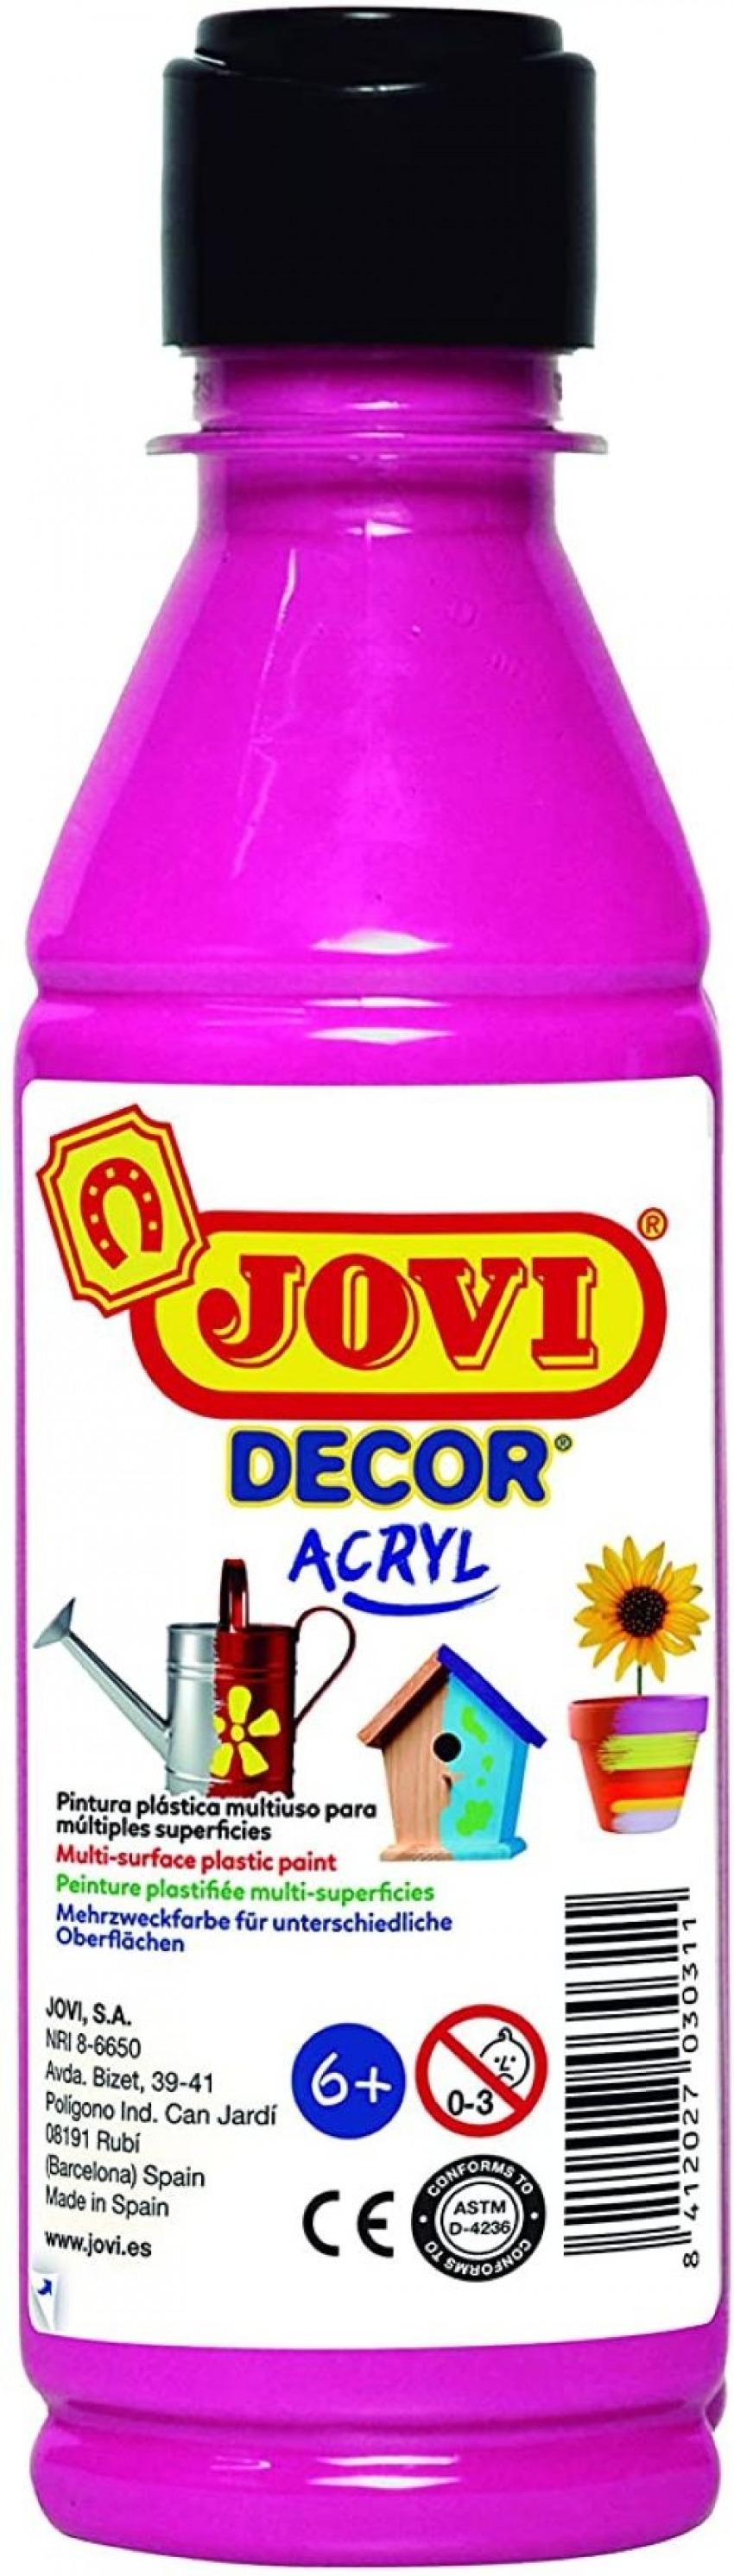 BOTE PINTURA JOVIDECOR ACRYL MAGENTA 250ML 8412027024419